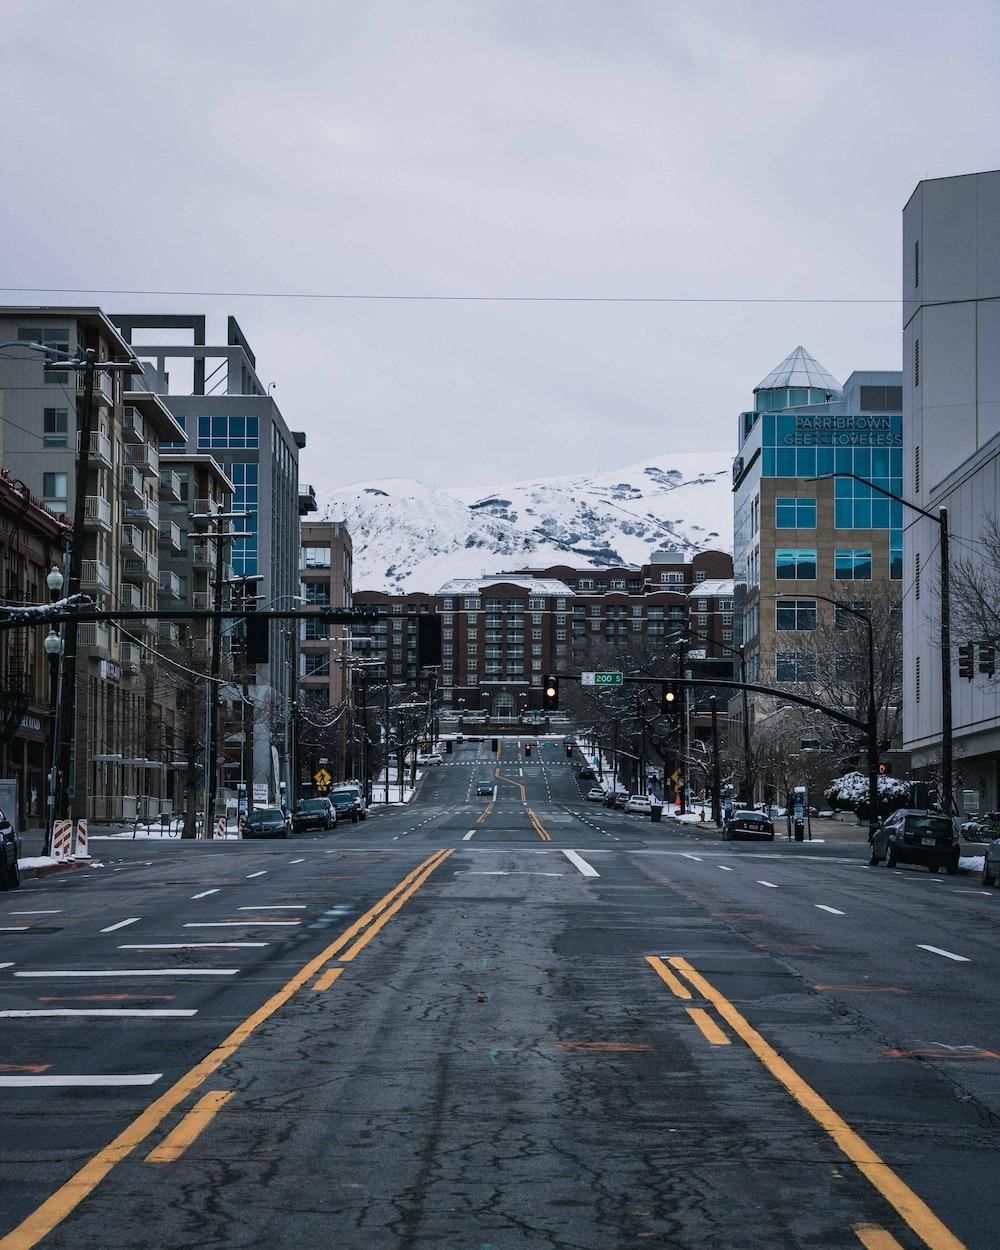 road between buildings under gray sky